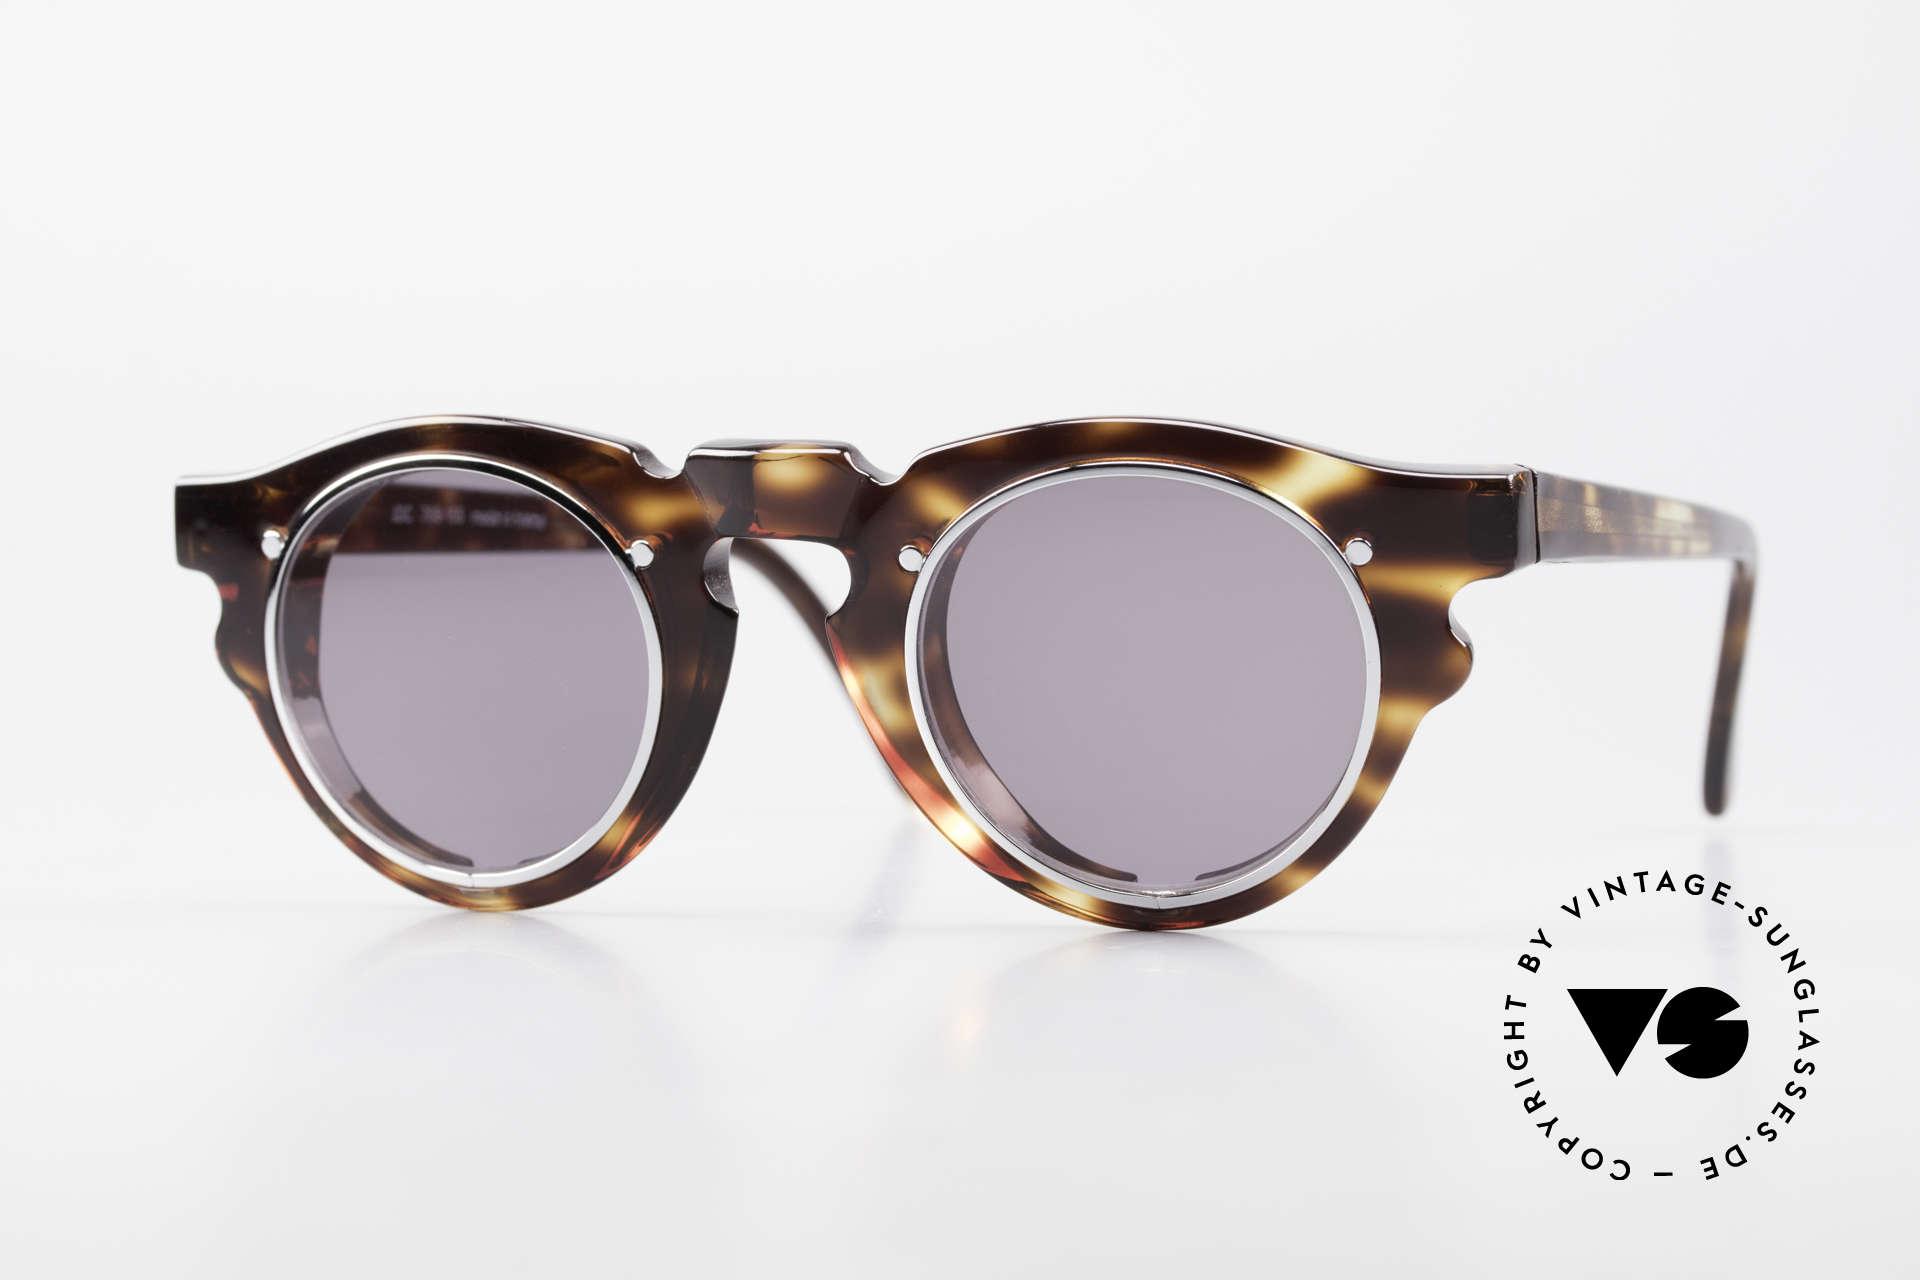 IDC 768 True Vintage Panto Sunglasses, distinctive 90's designer sunglasses by IDC, France, Made for Men and Women